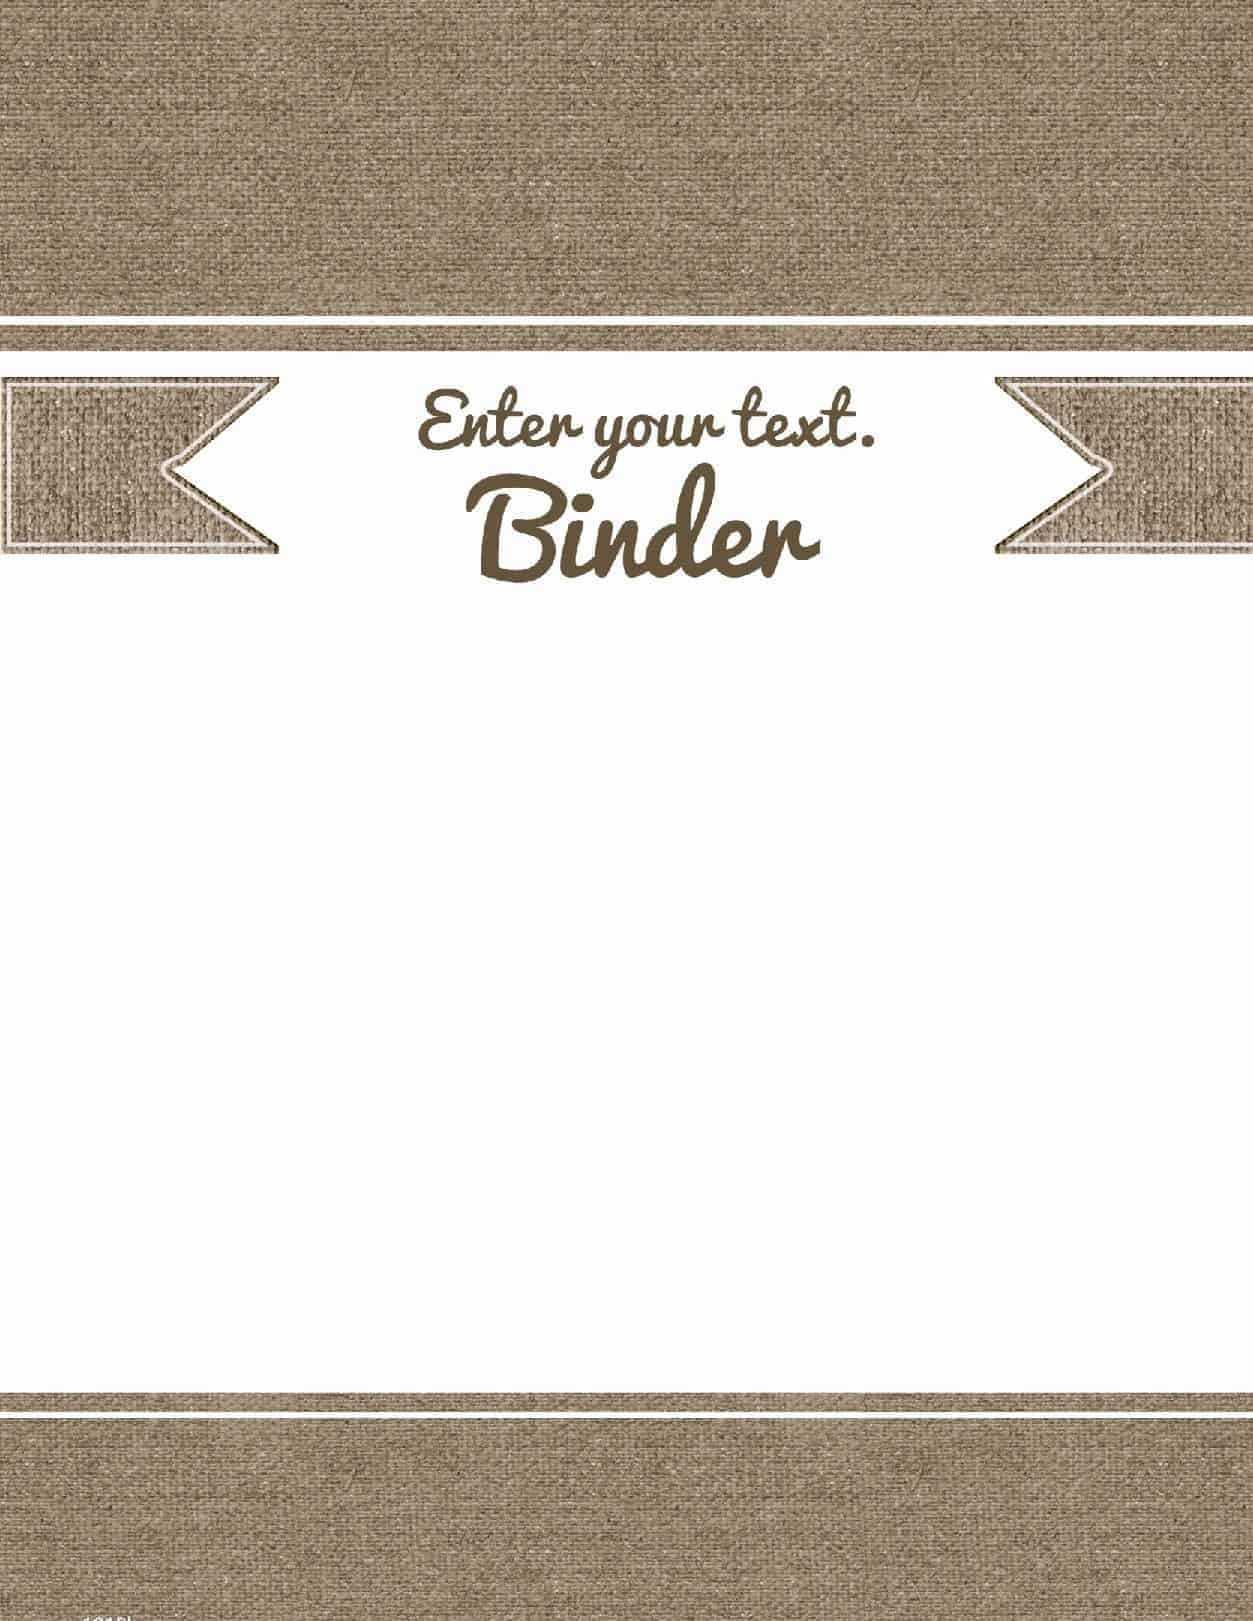 Binder Cover Template 27 Free Printable Word Pdf Jpg Psd With Free Printable Binder Cover Templates